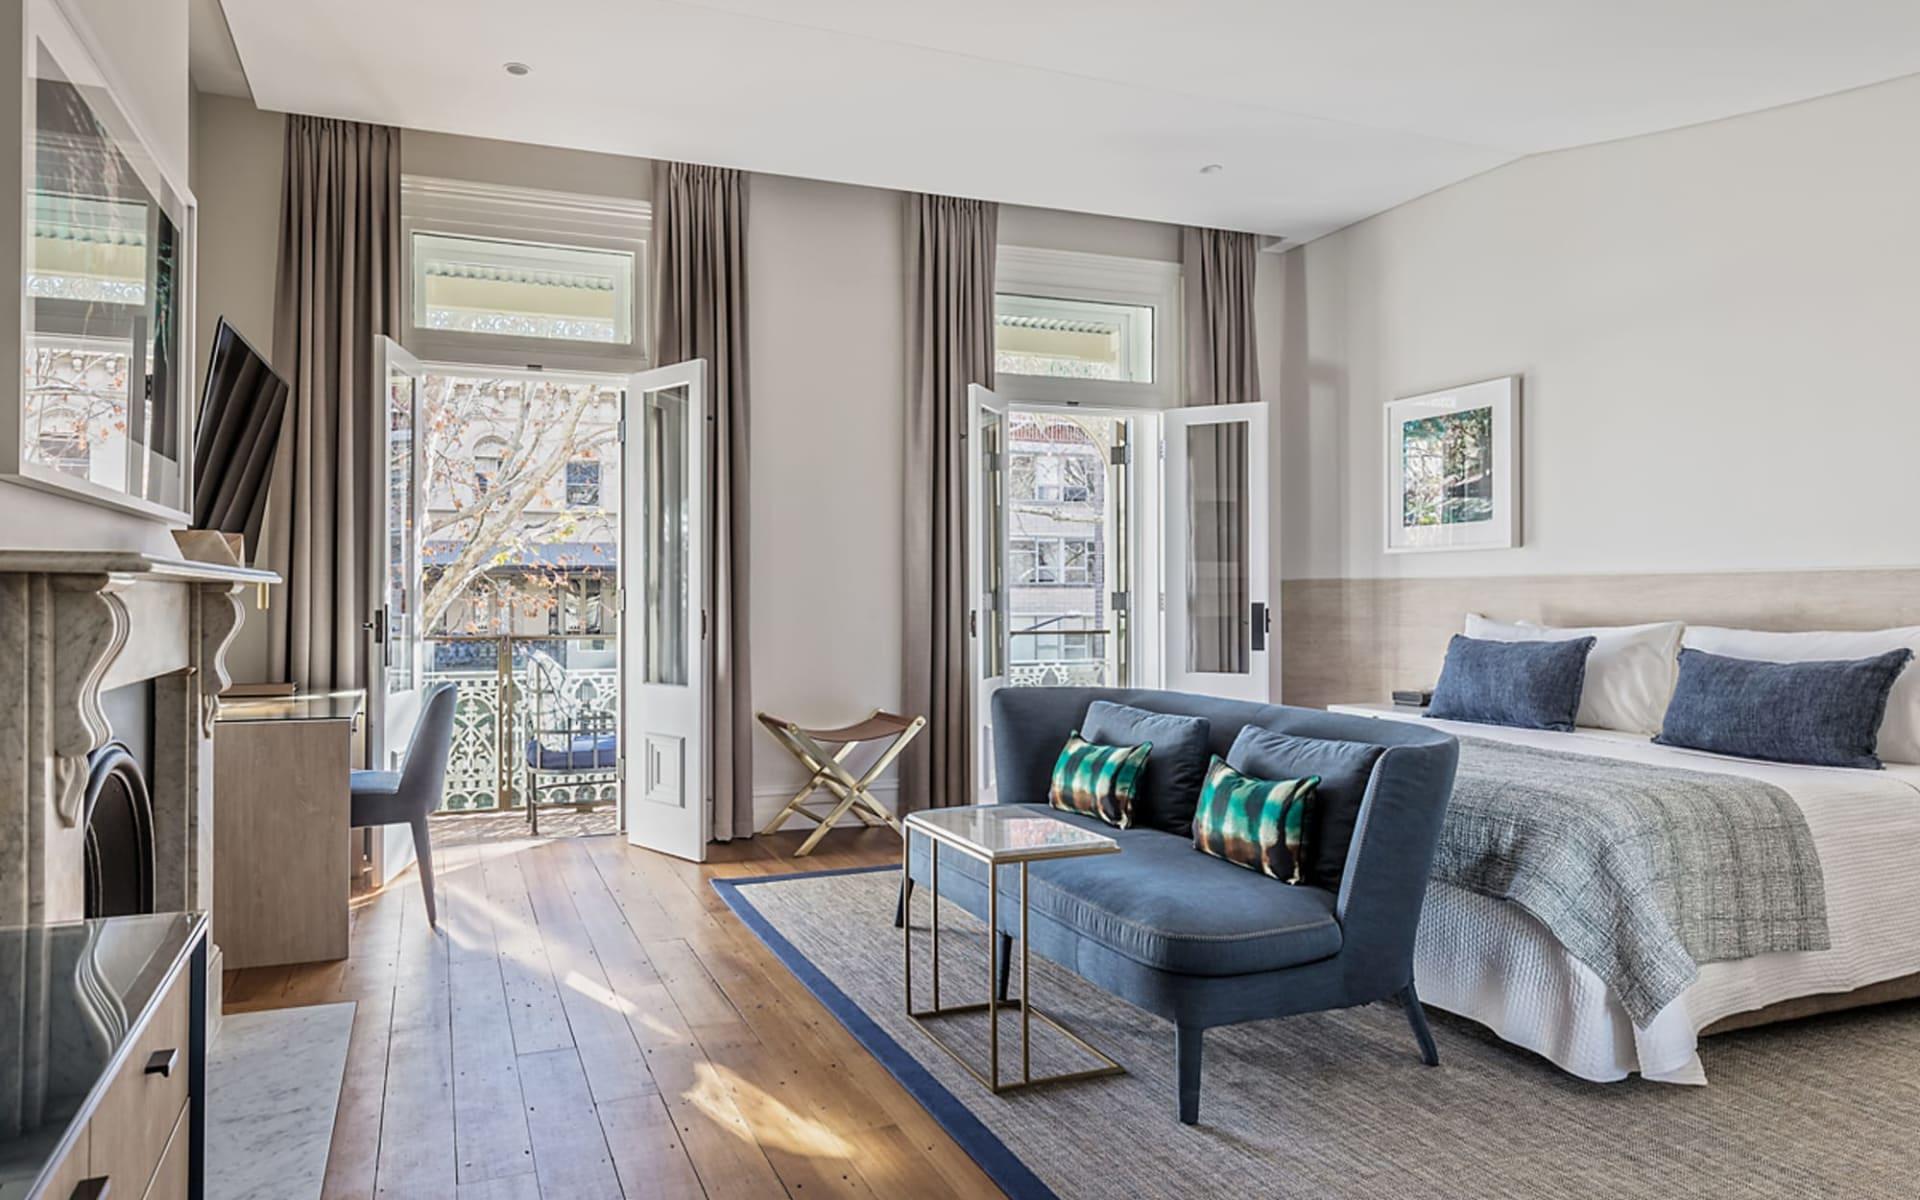 Spicers Potts Point Sydney:  Spicers Potts Point Sydney New South Wales Australien  Victoria Terrace Suite 2018